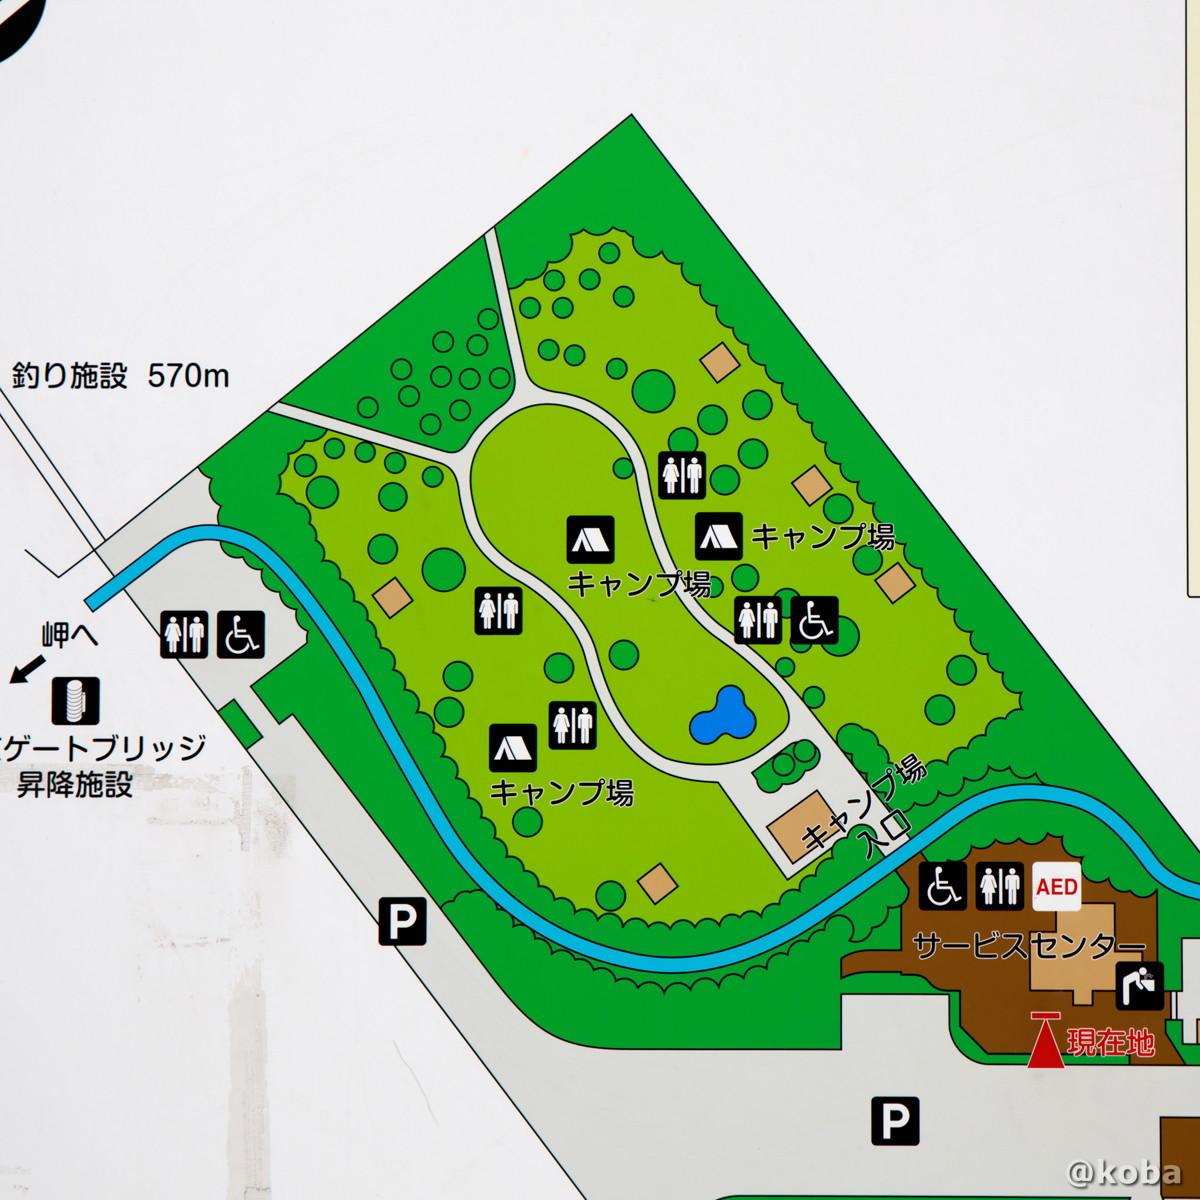 キャンプ場 案内図│若洲公園│江東区